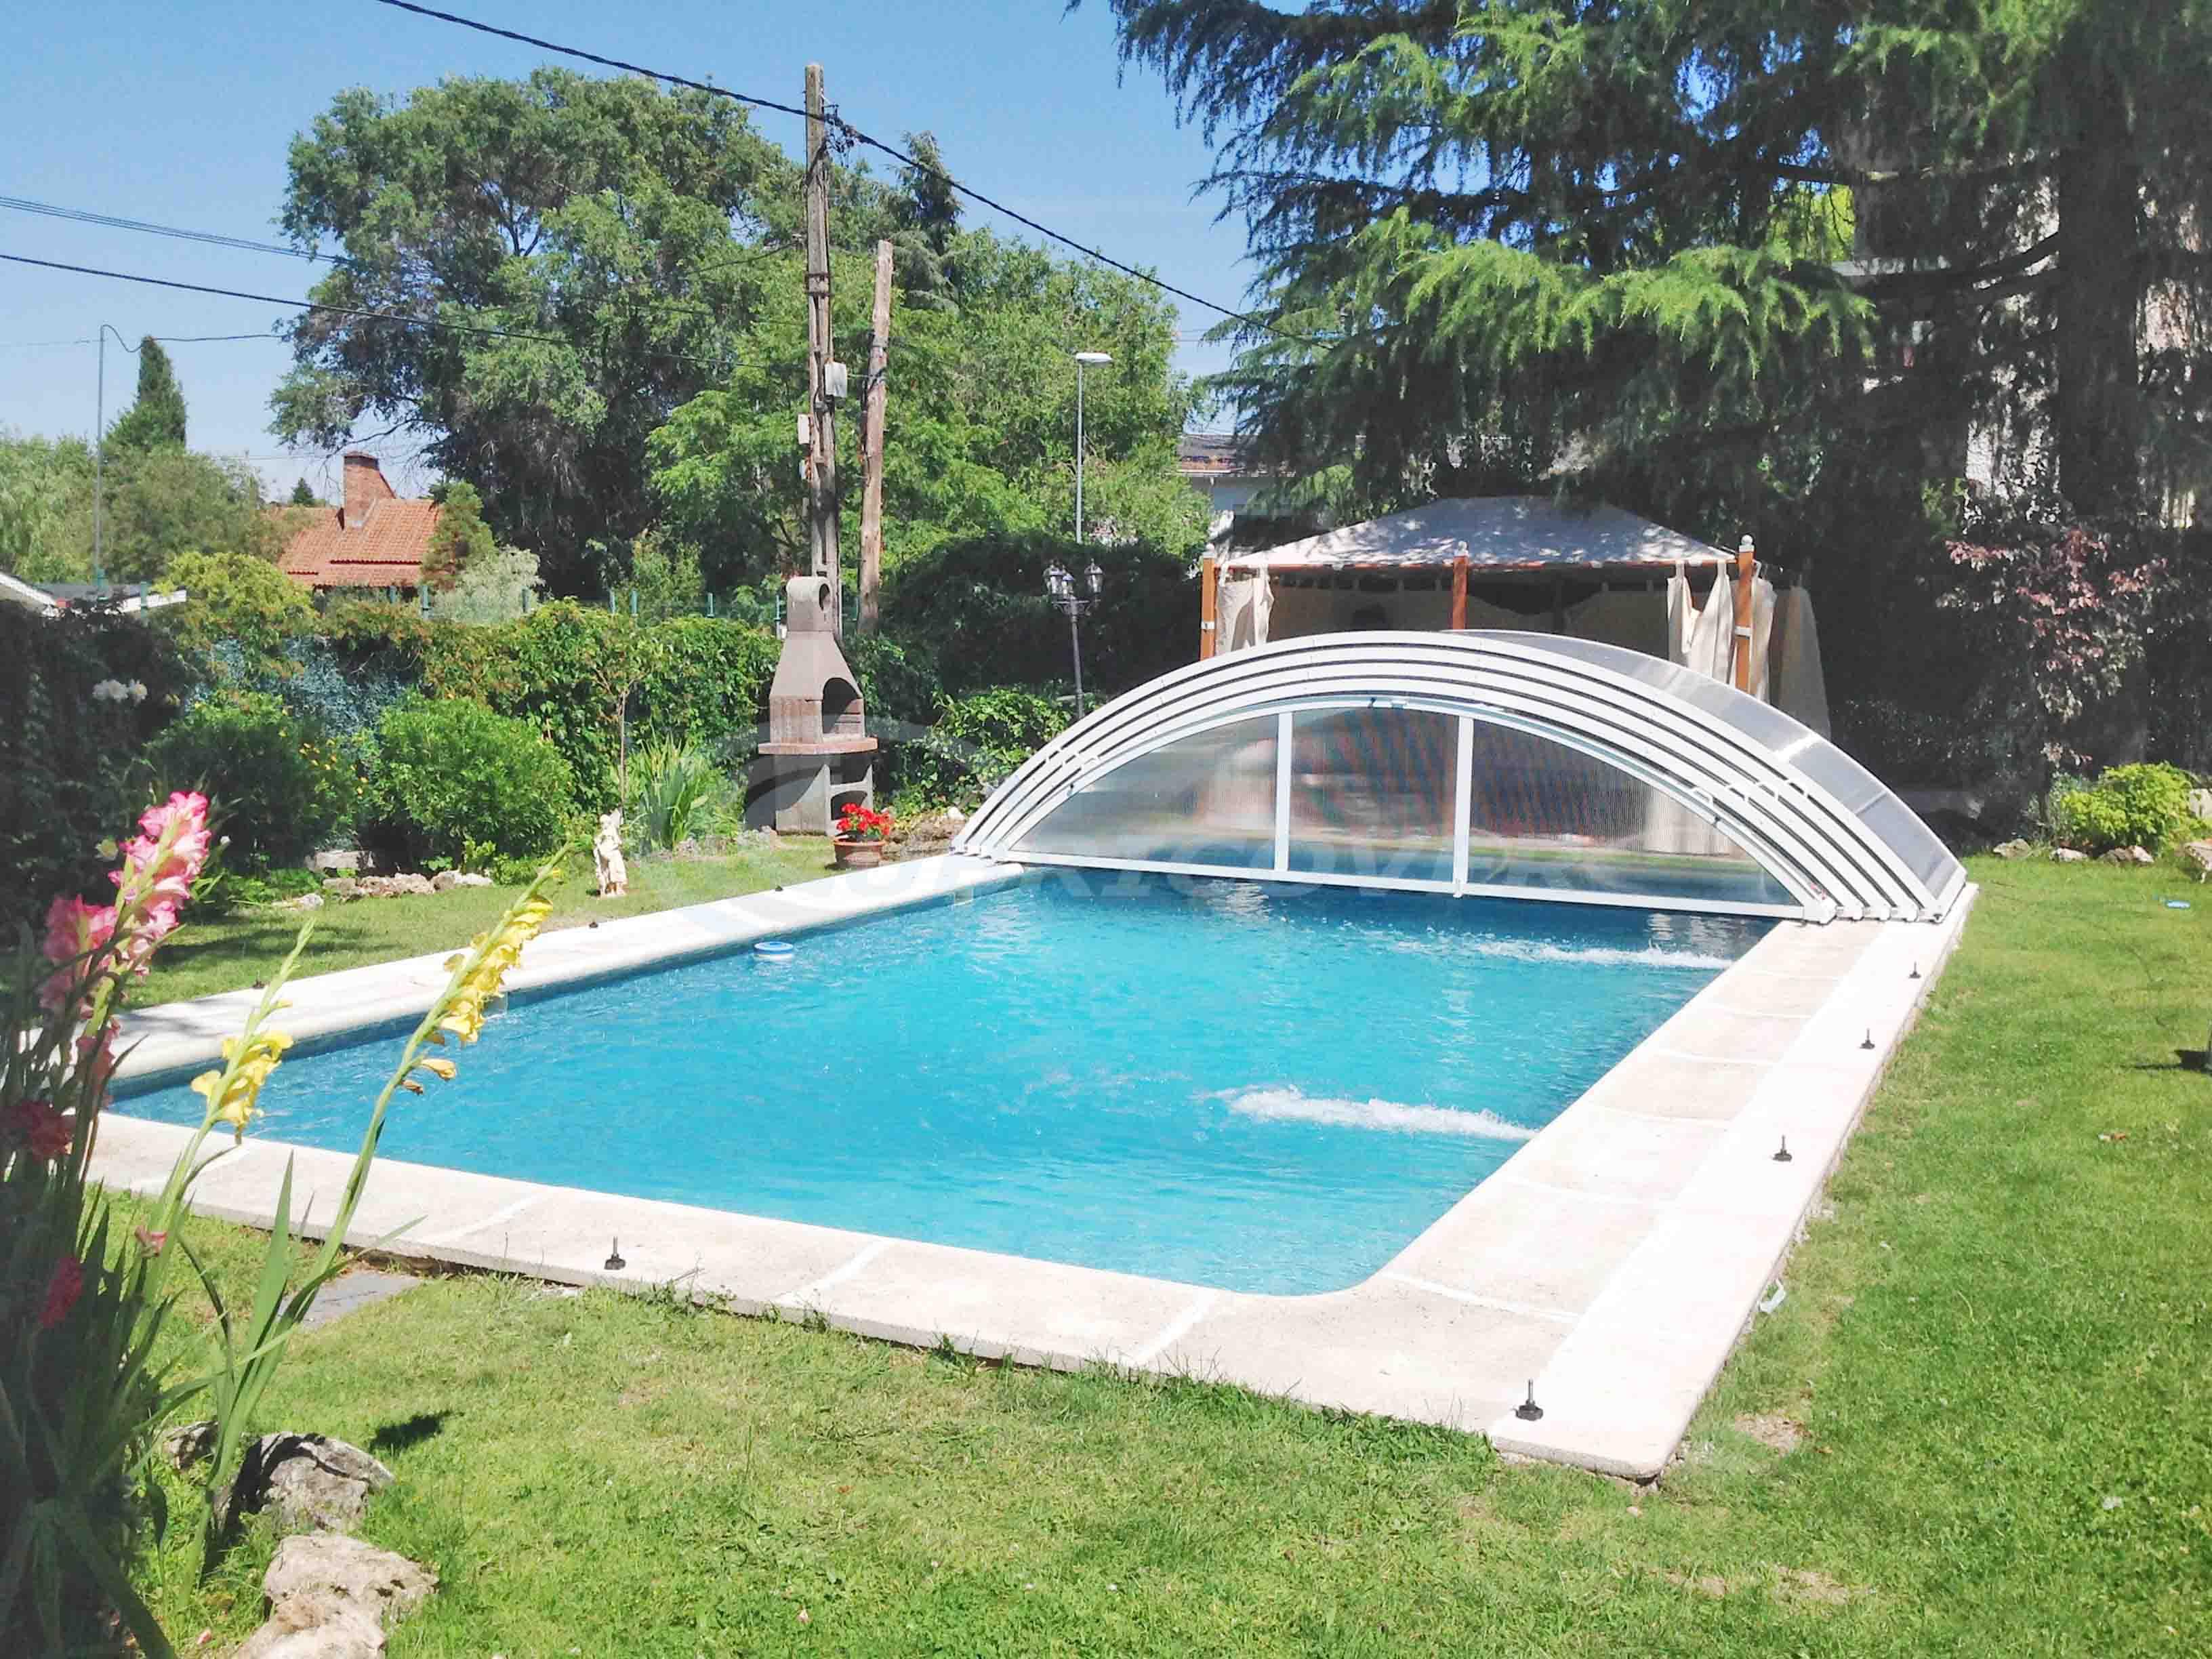 Cubierta para piscina baja telesc pica cubricover for Piscina cubierta zaragoza